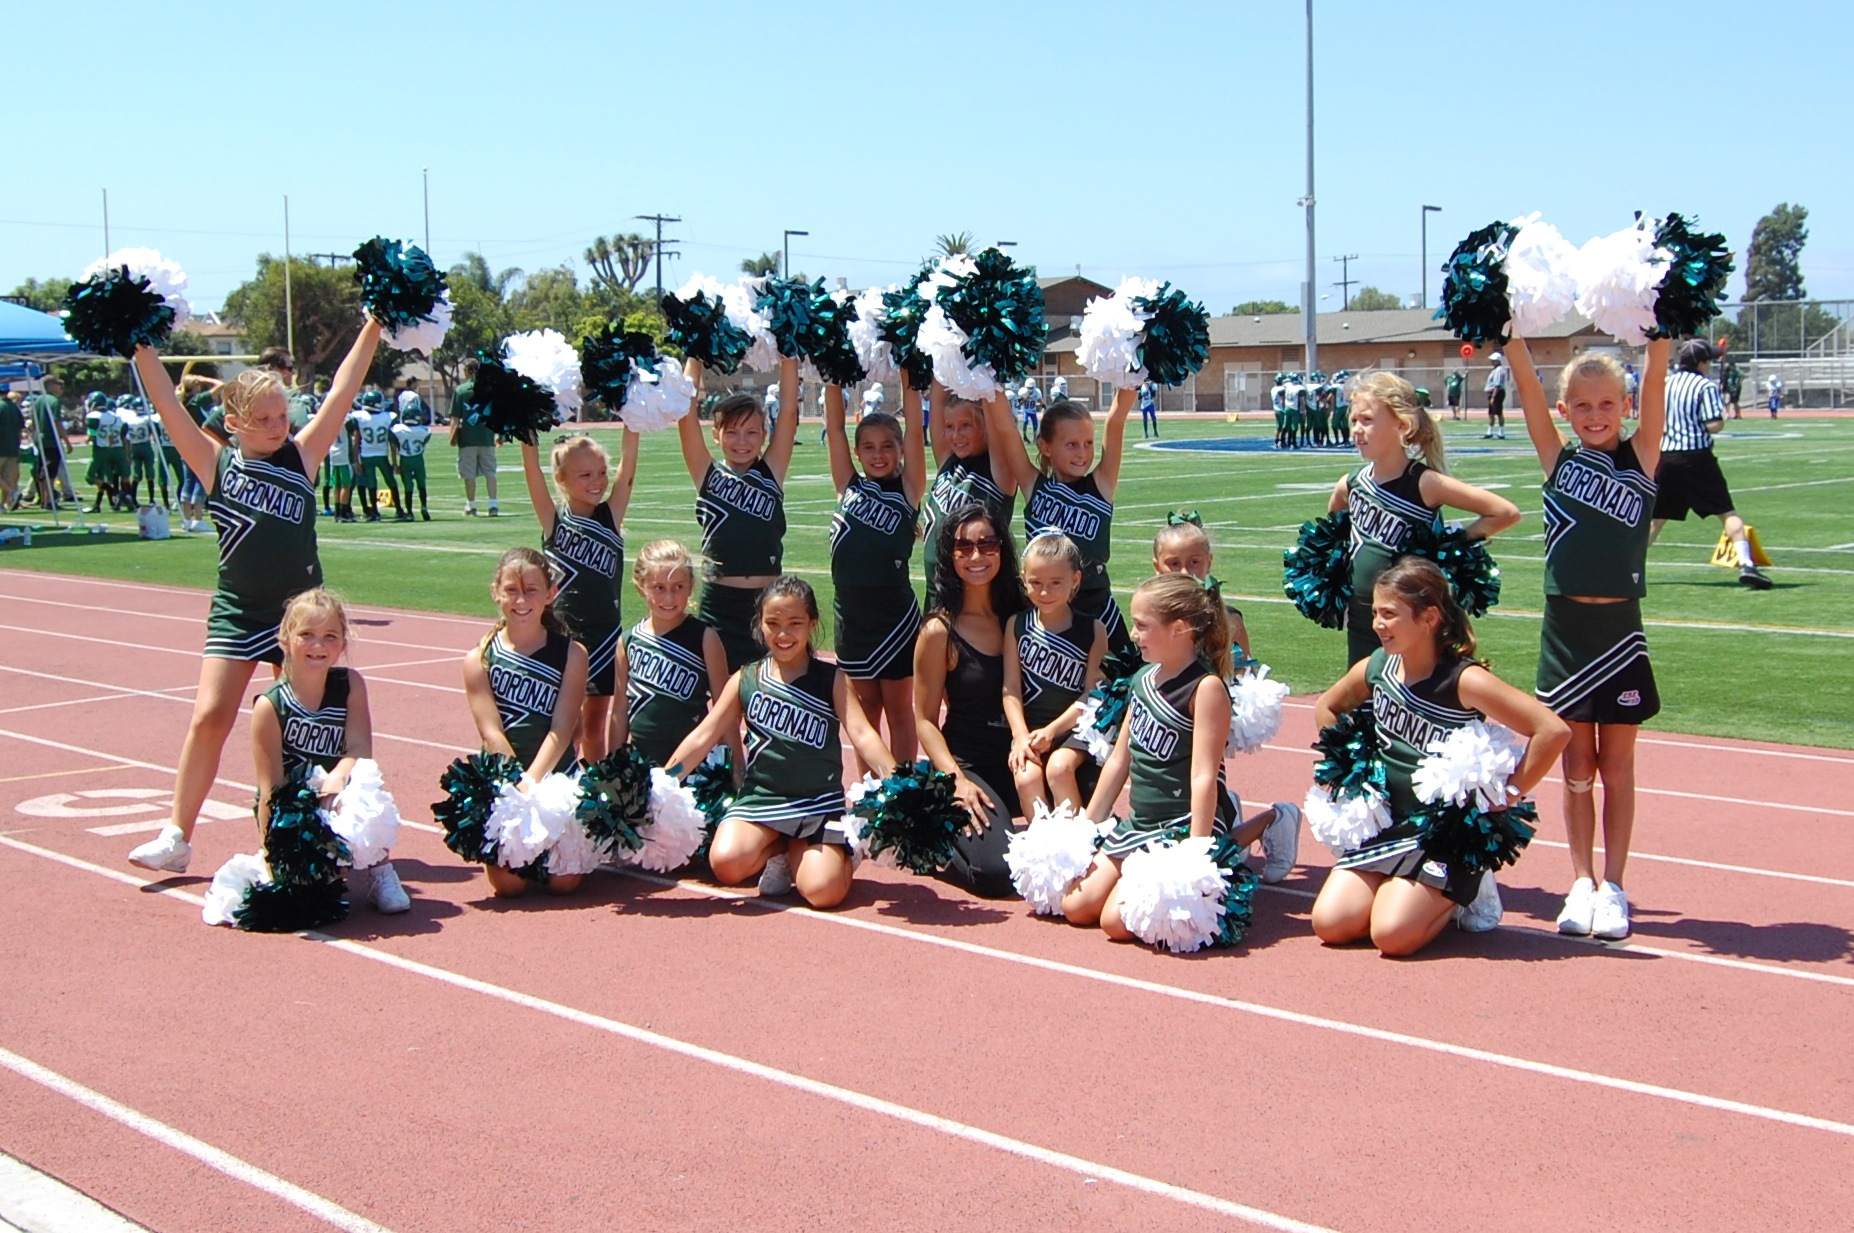 Science Cheerleader Taylor leads citizen science project with Pop Warner cheerleaders in San Diego.